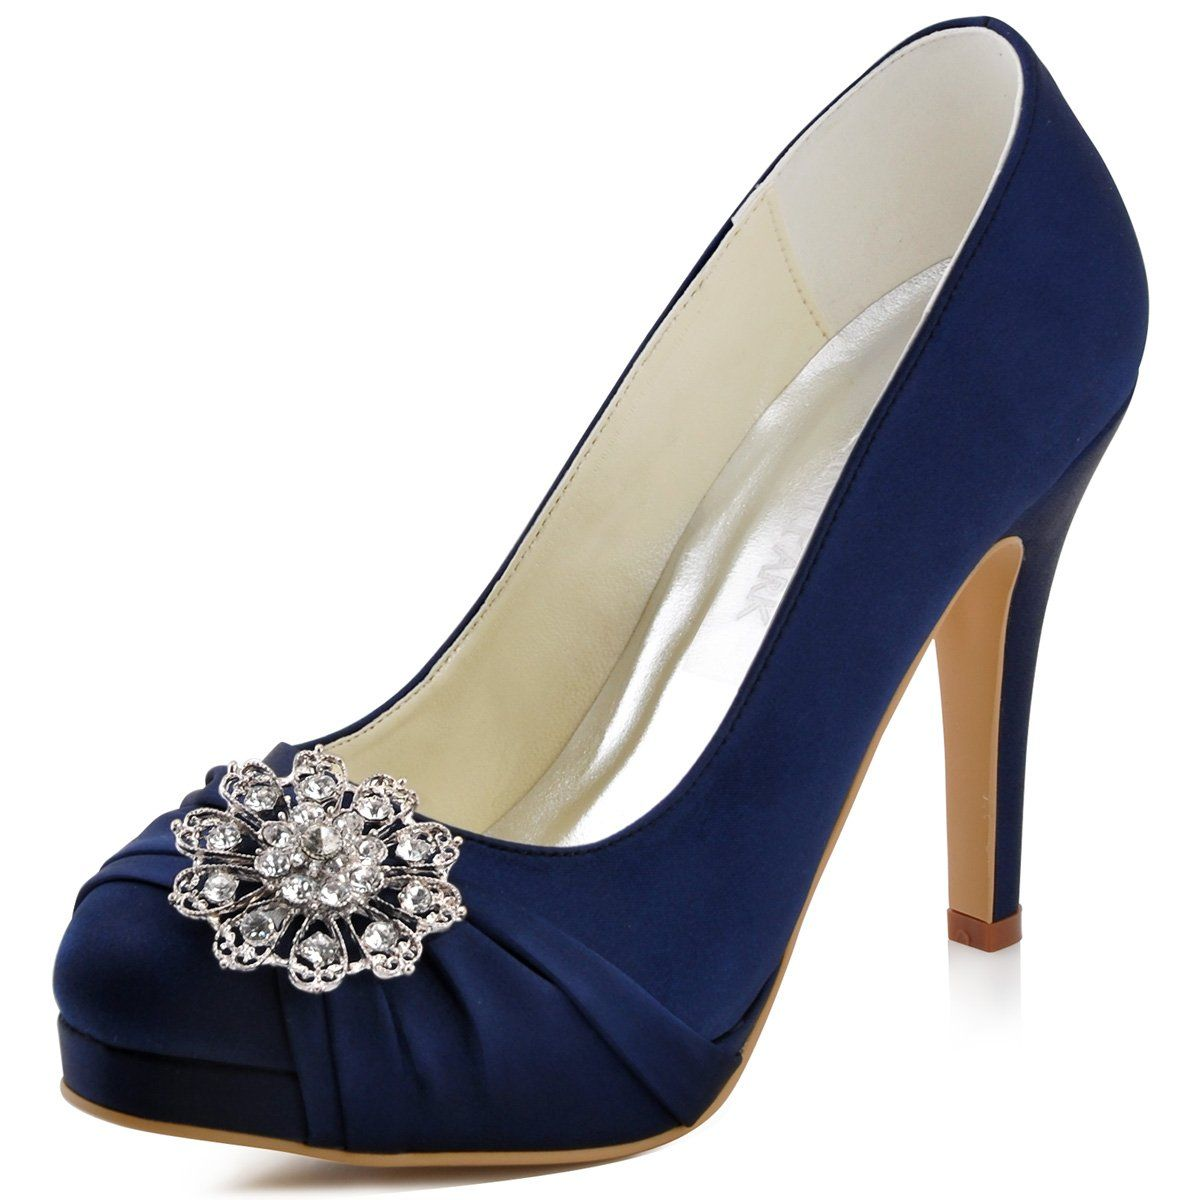 Eleganrpark EP2015 PF Womenu0027s Prom Pumps High Heel Rhinstones Satin Wedding  Bridal Shoes Navy Blue US 10